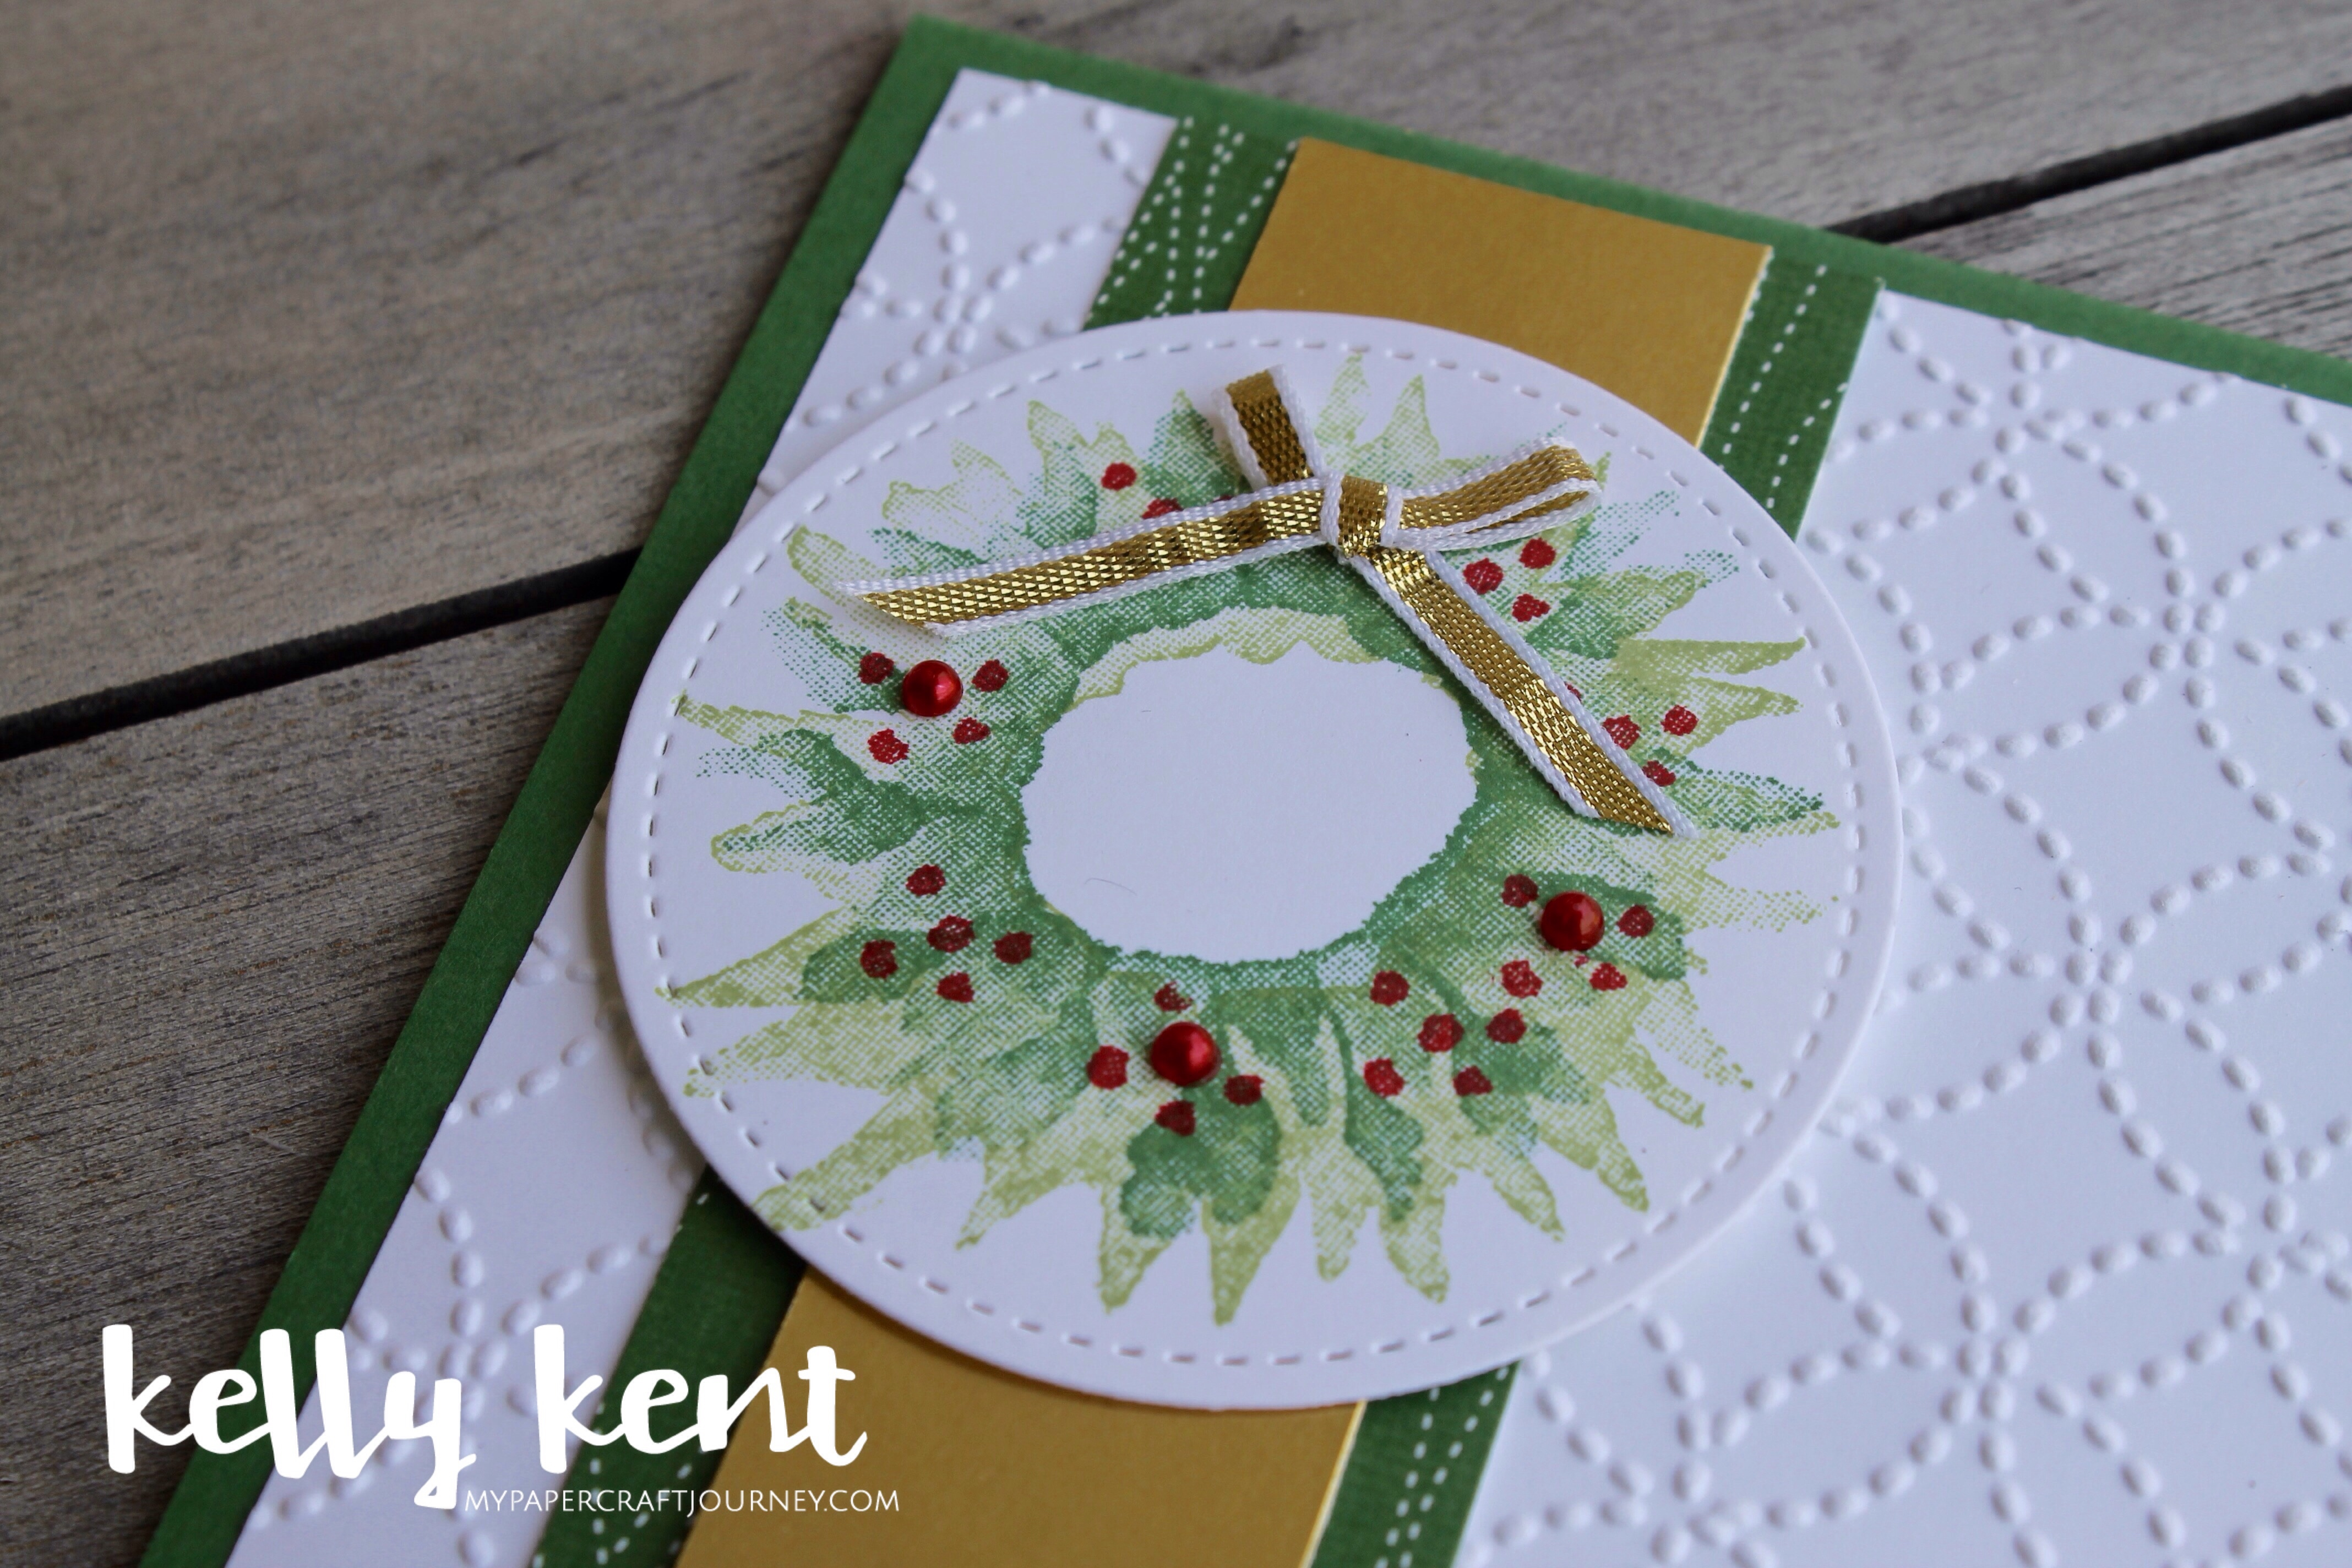 Painted Wreath | kelly kent